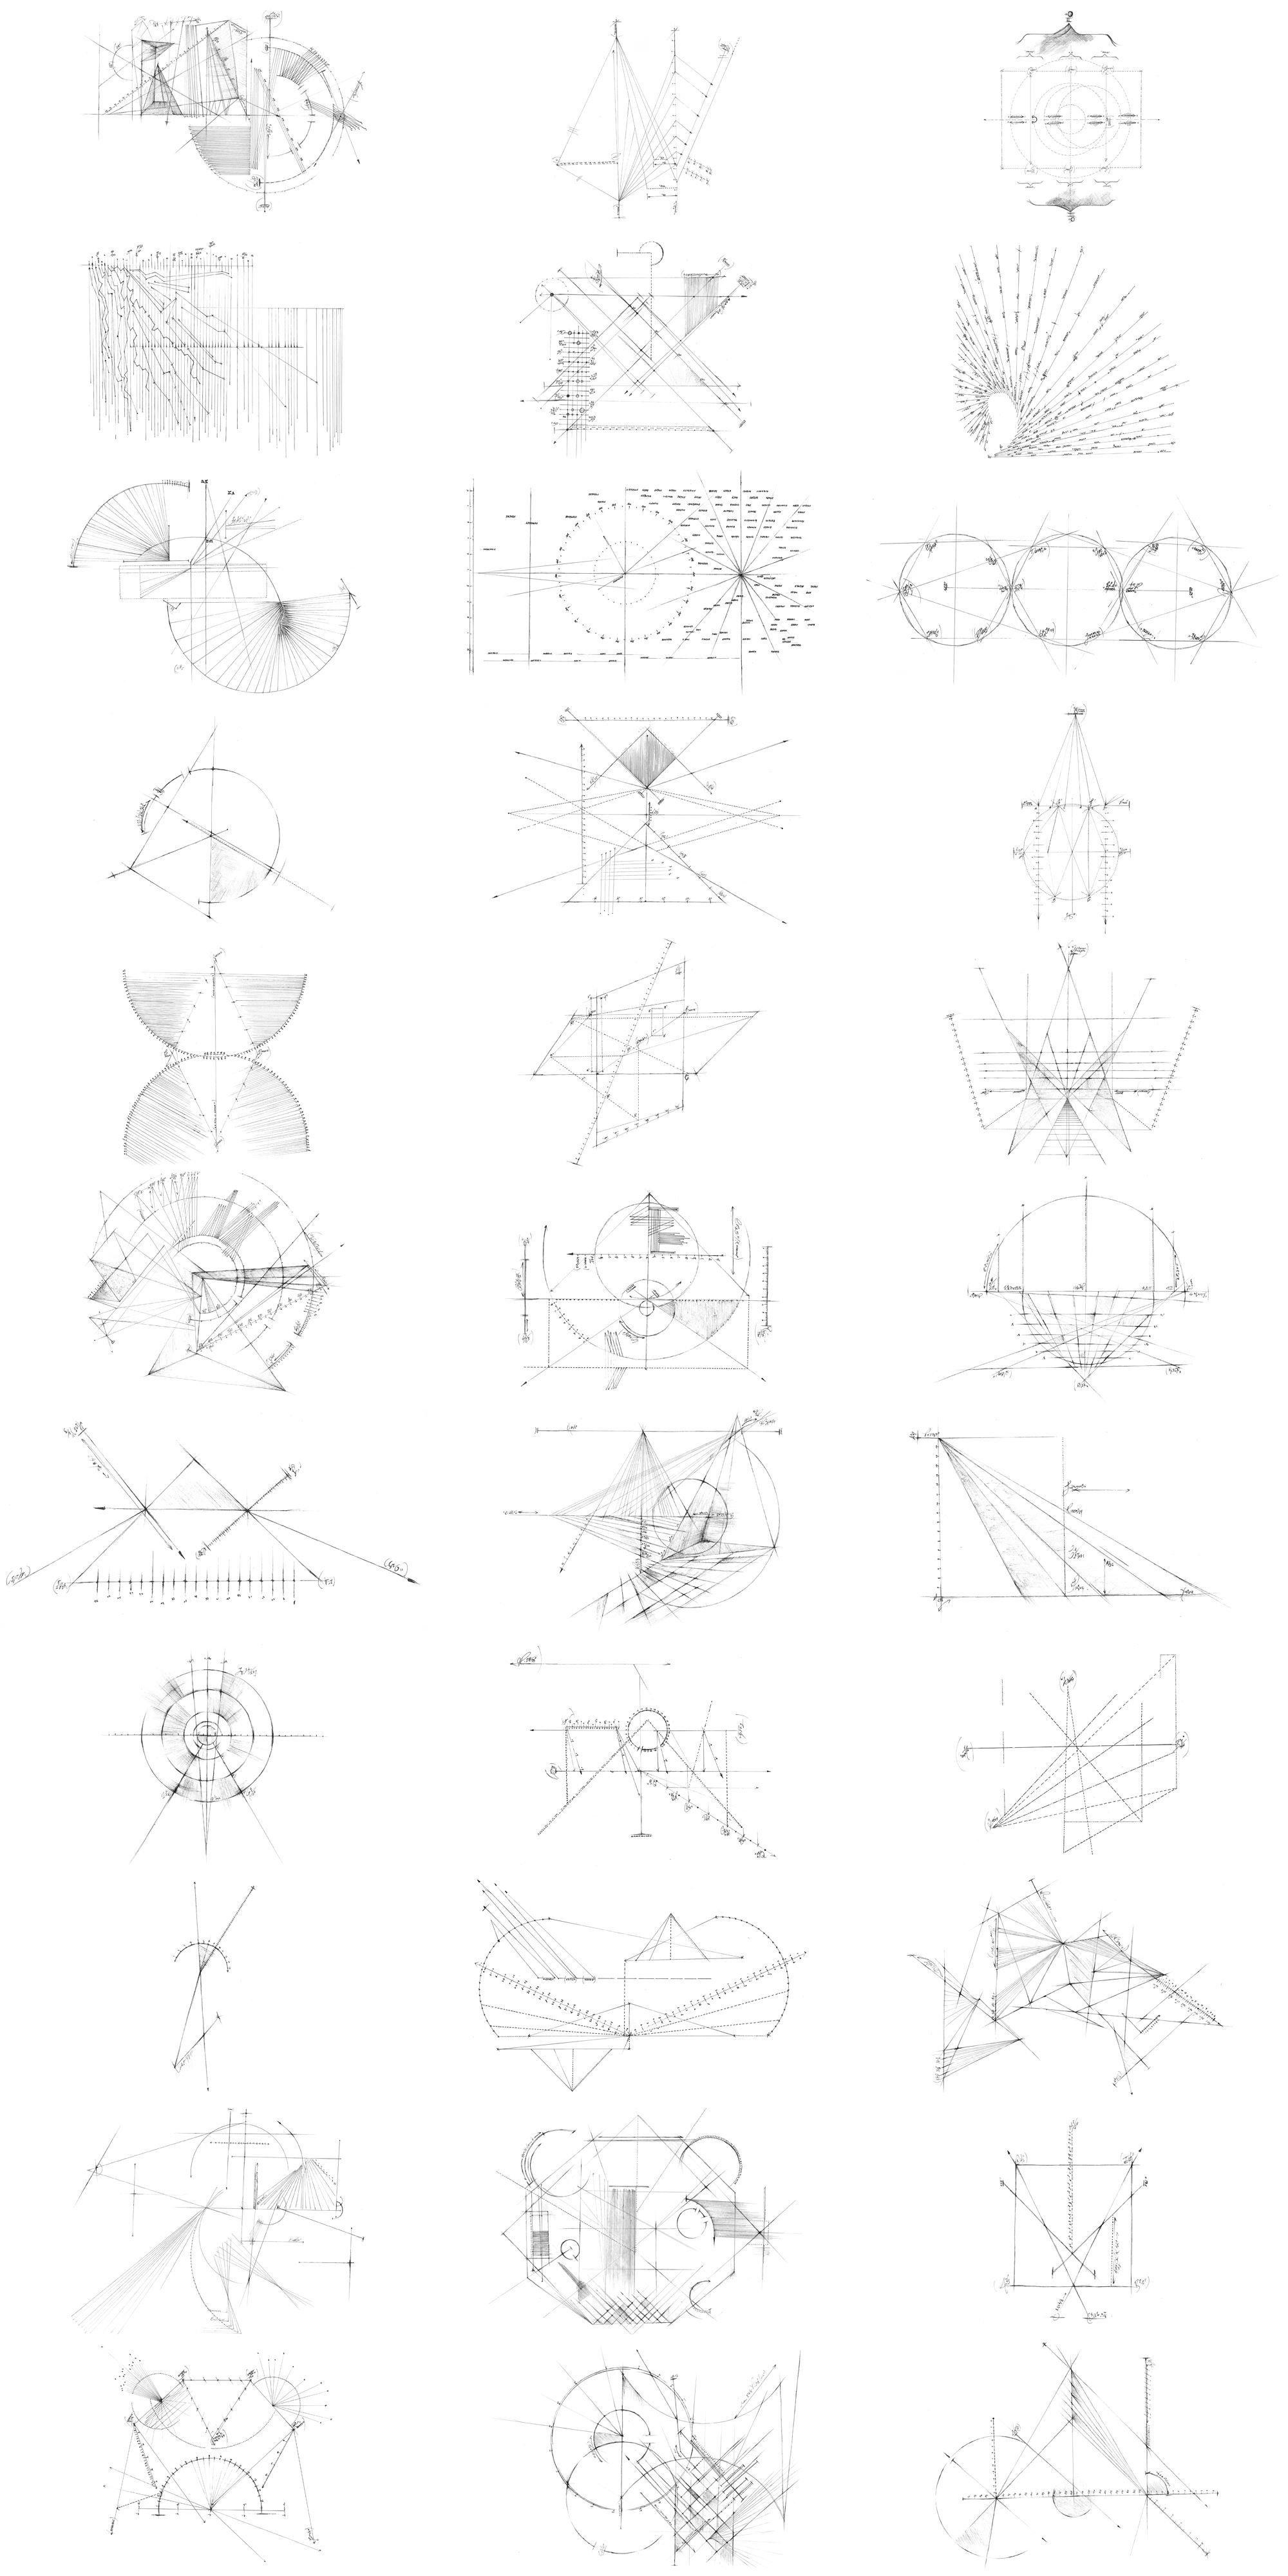 高质量32个技术线条绘图PS笔刷下载designshidai_bishua076